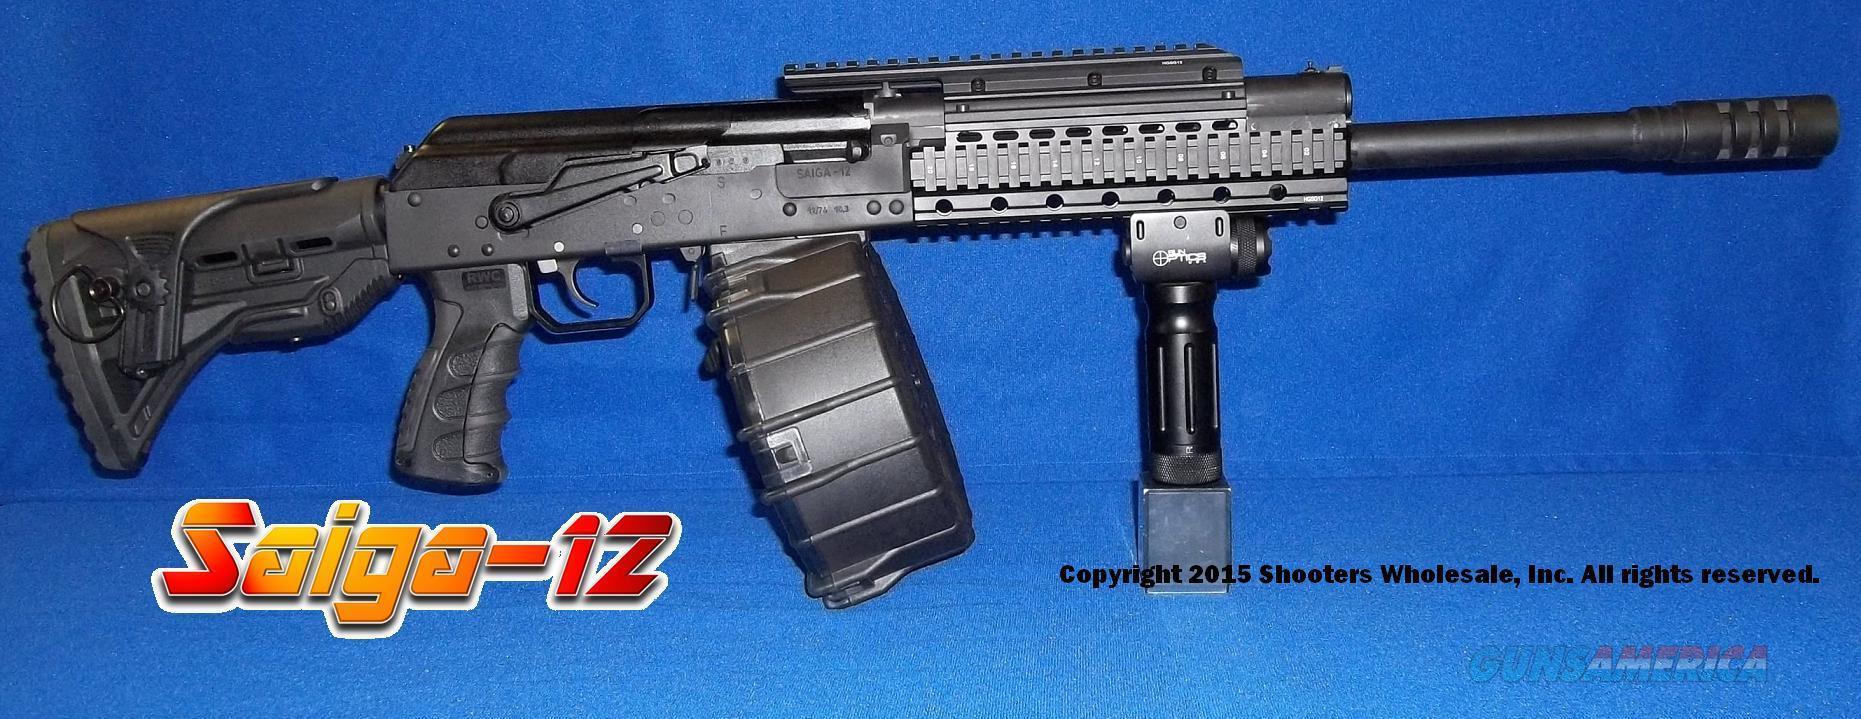 SAIGA 12 RUSSIAN AK47 TACTICAL 12 GAUGE SHOTGUN... for sale on aw gun, mm gun, gm gun, dd gun, tt gun, mr gun, sg gun, sk gun,